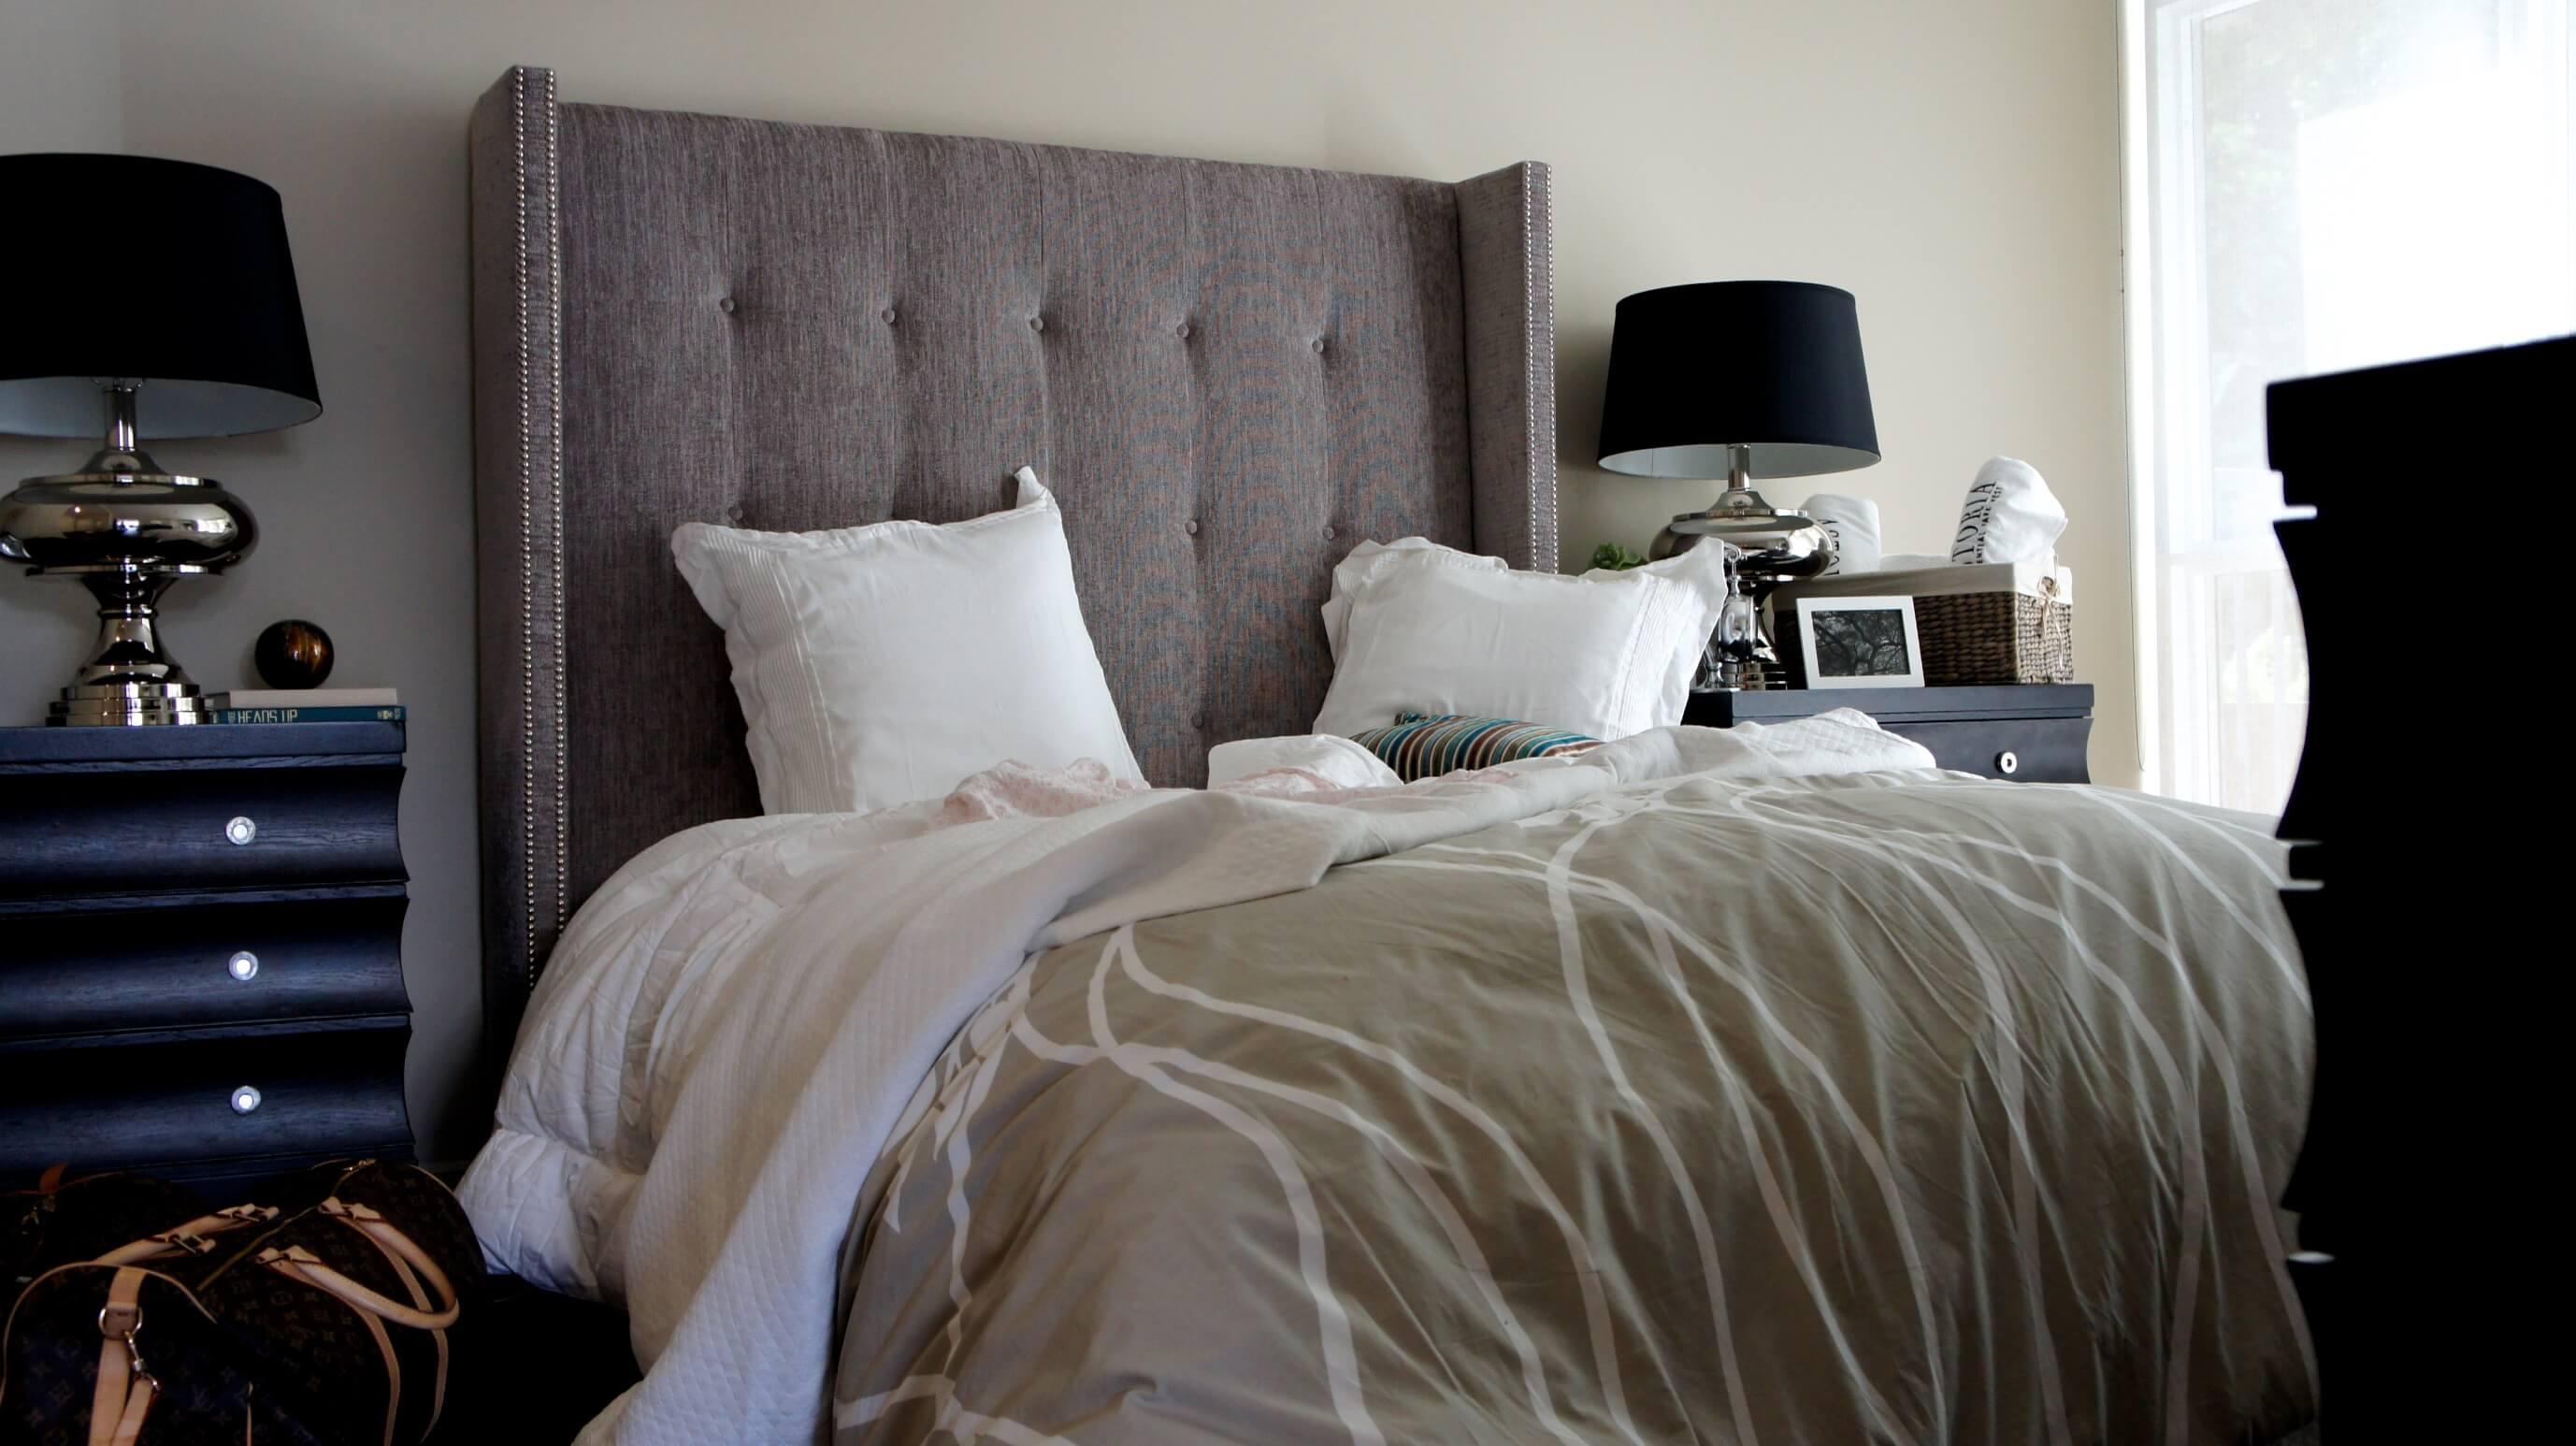 astoria-at-central-park-west-x-nubry-luxury-apartments-irvine-california-6